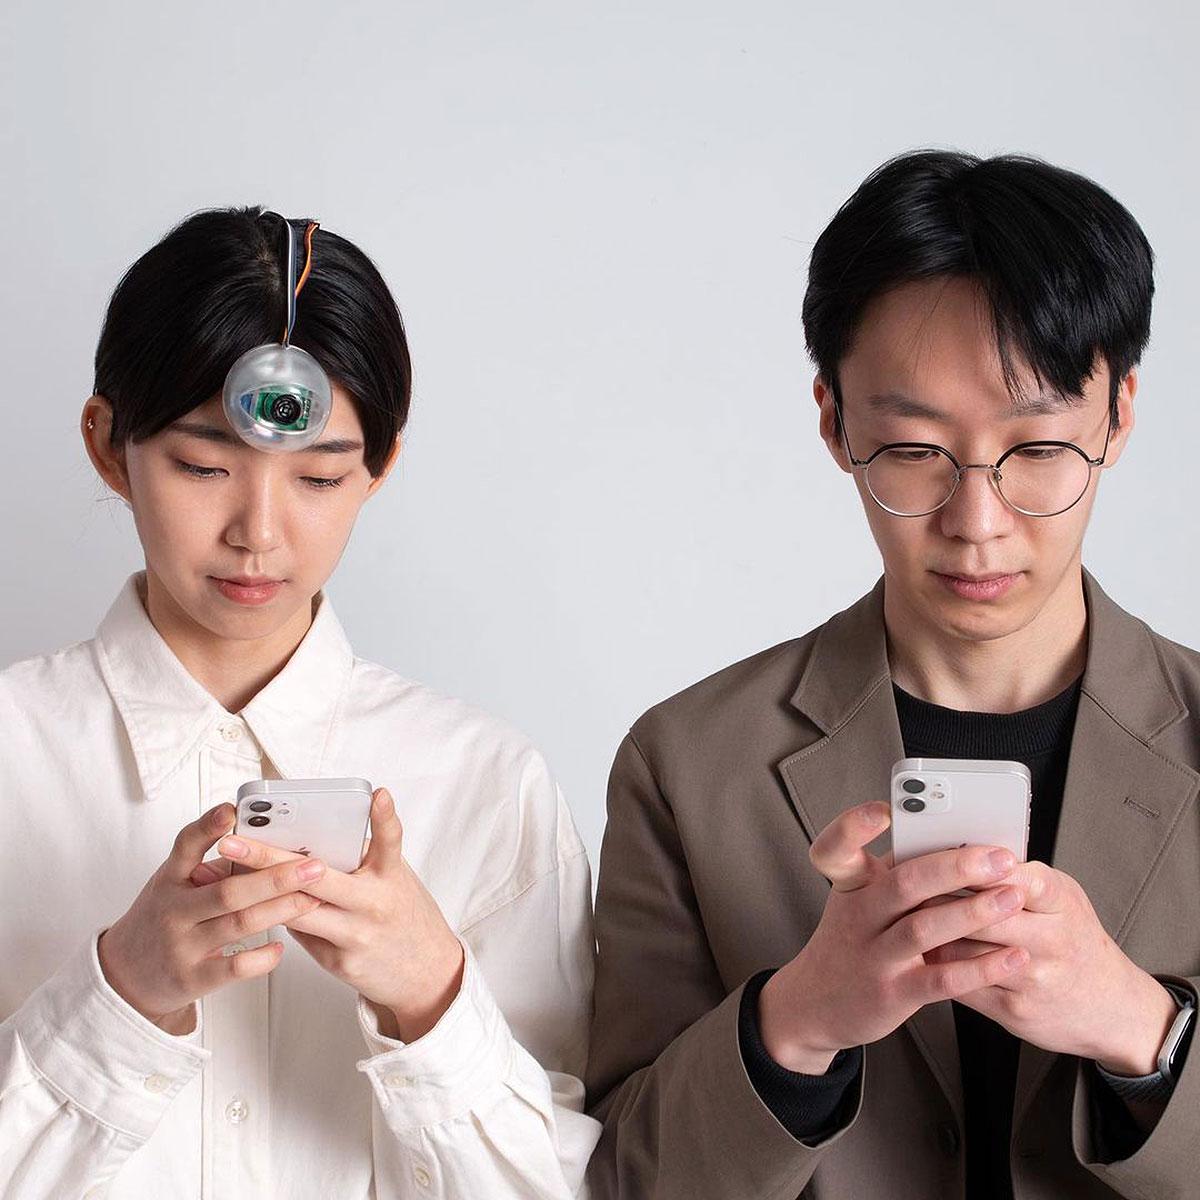 Wearable Third Eye by Minwook Paeng